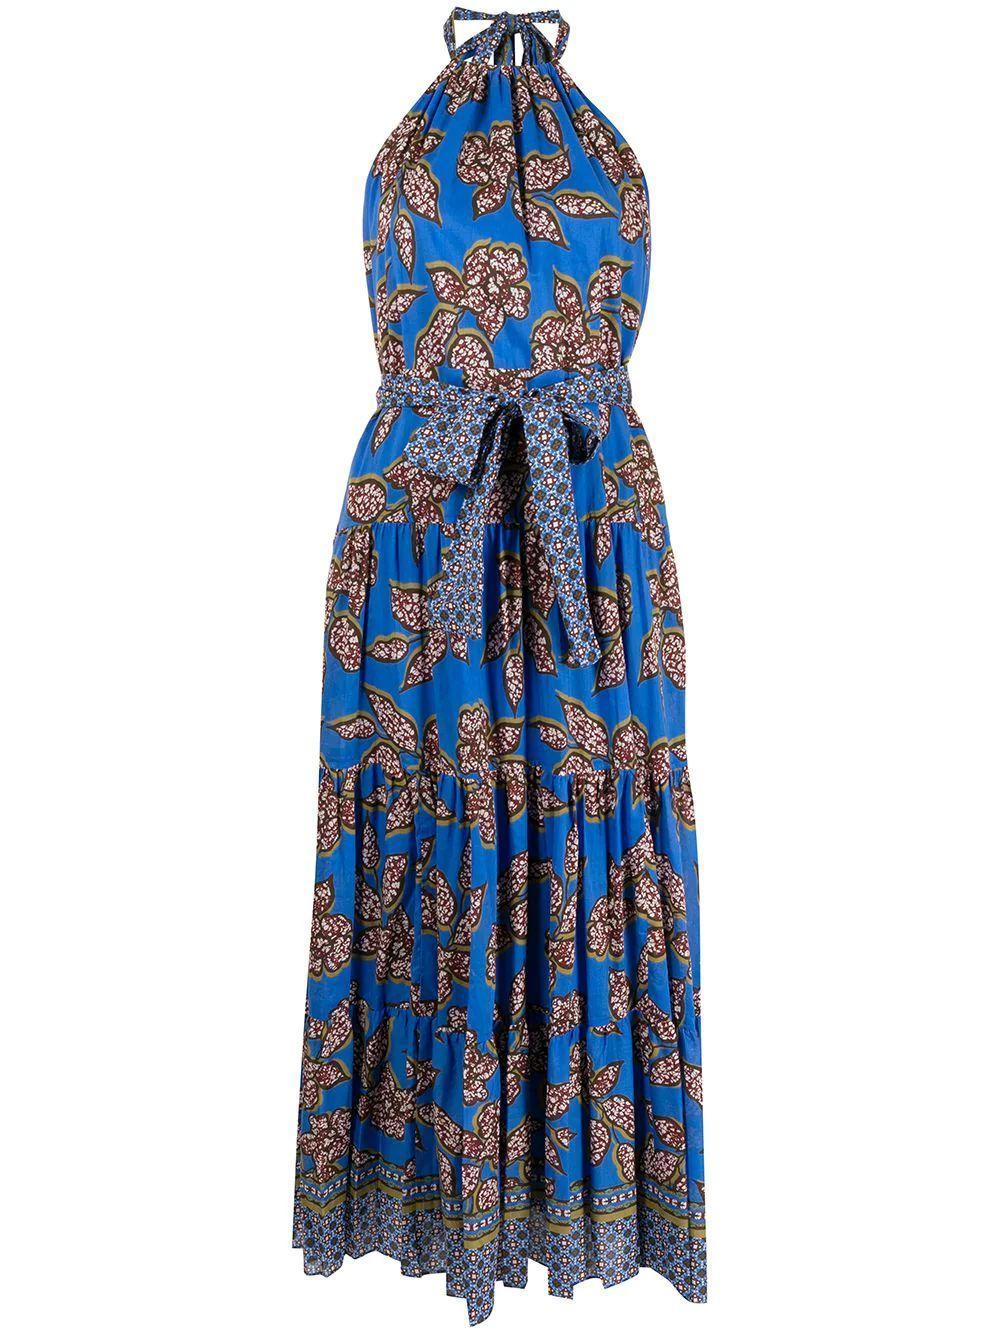 Joyette Printed Maxi Dress Item # A1210423-7048